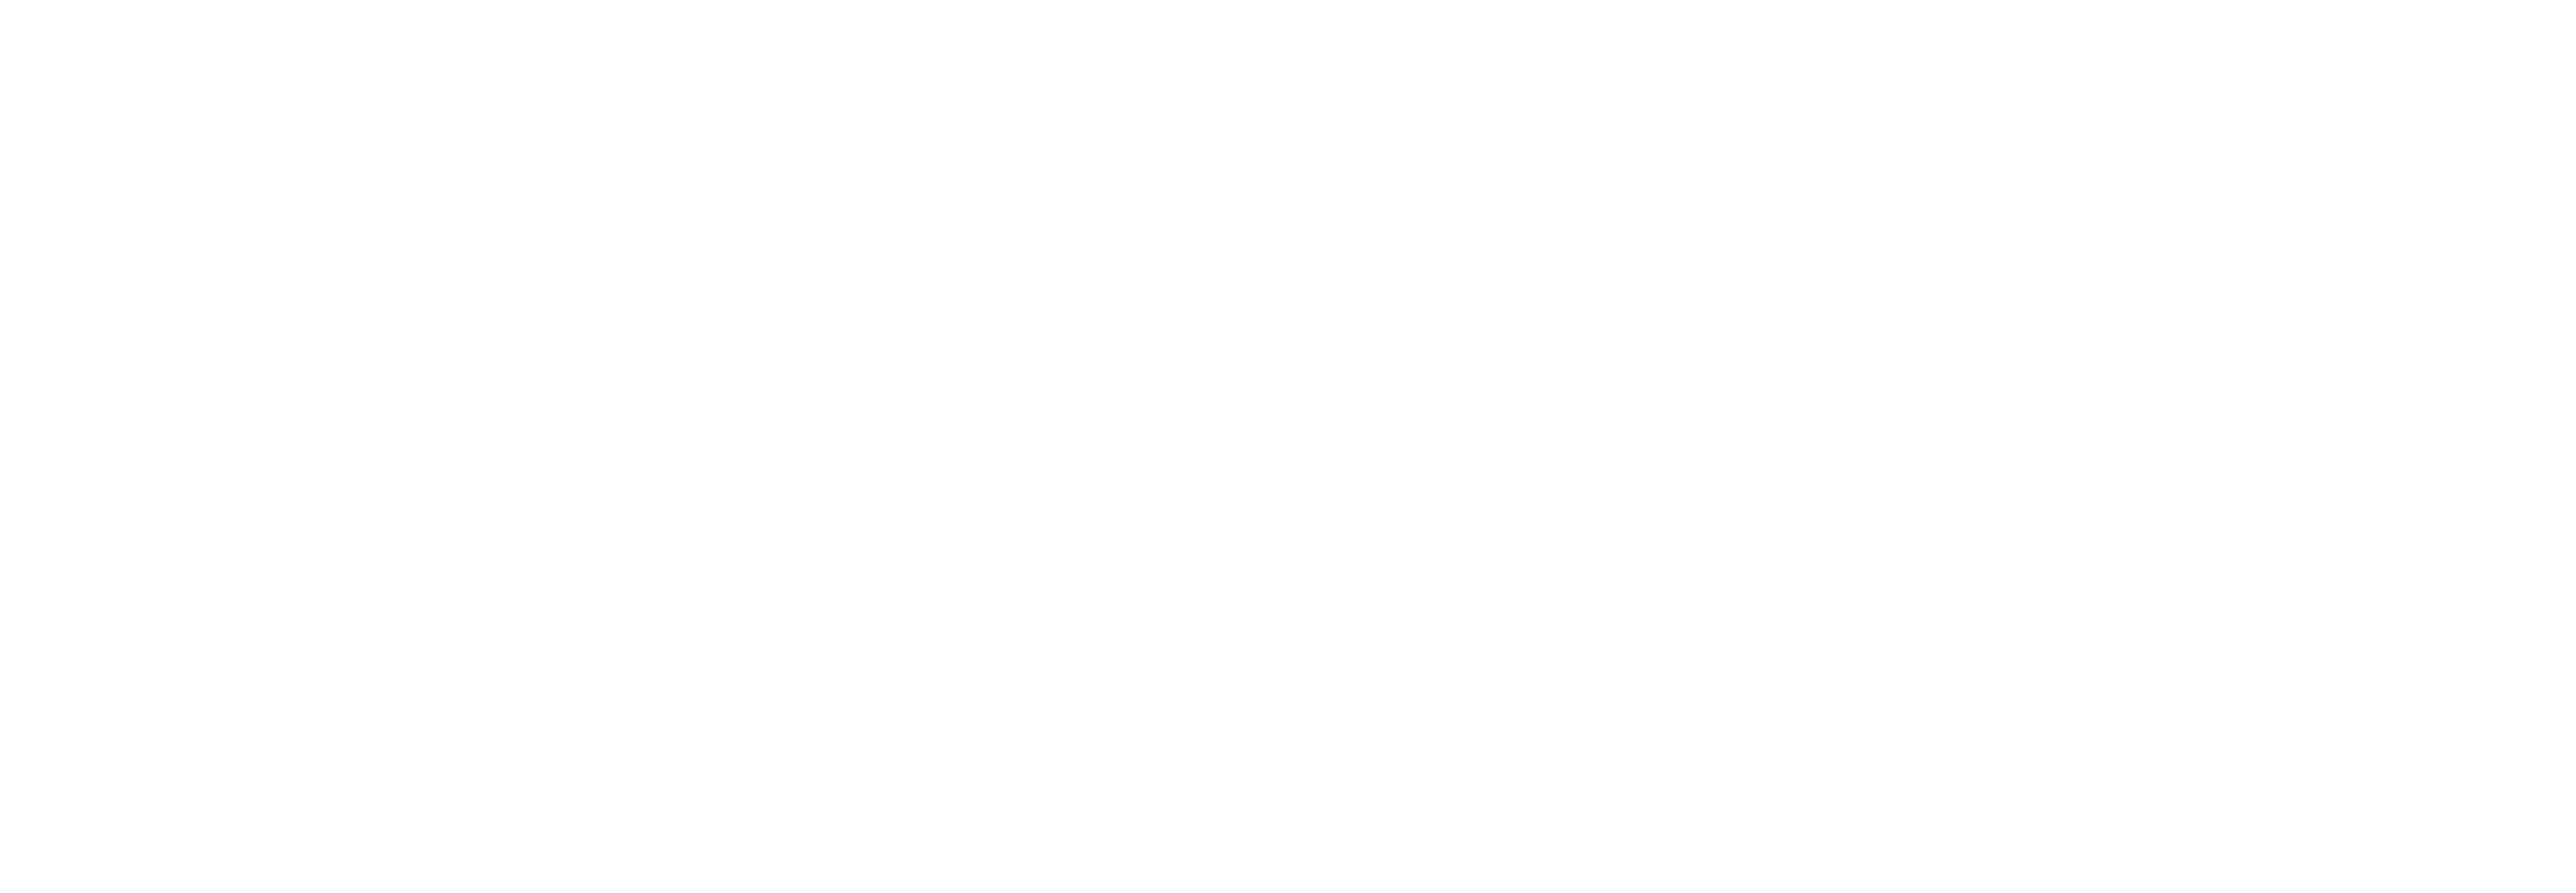 Luz Ferreira Palestras e Treinamentos